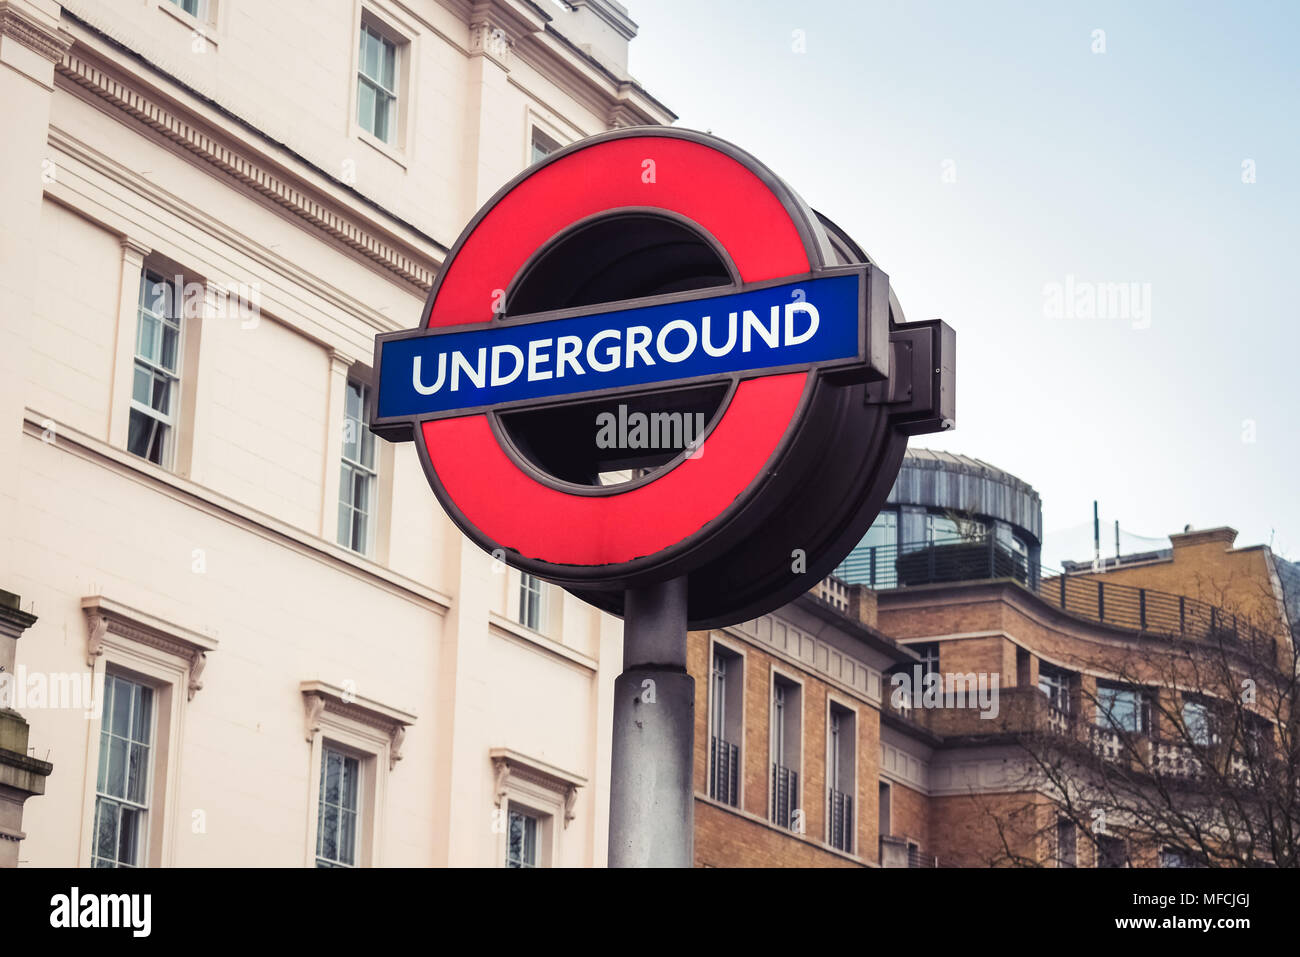 London / England - 02.07.2017: City information sign of tube (metro) entrance. - Stock Image